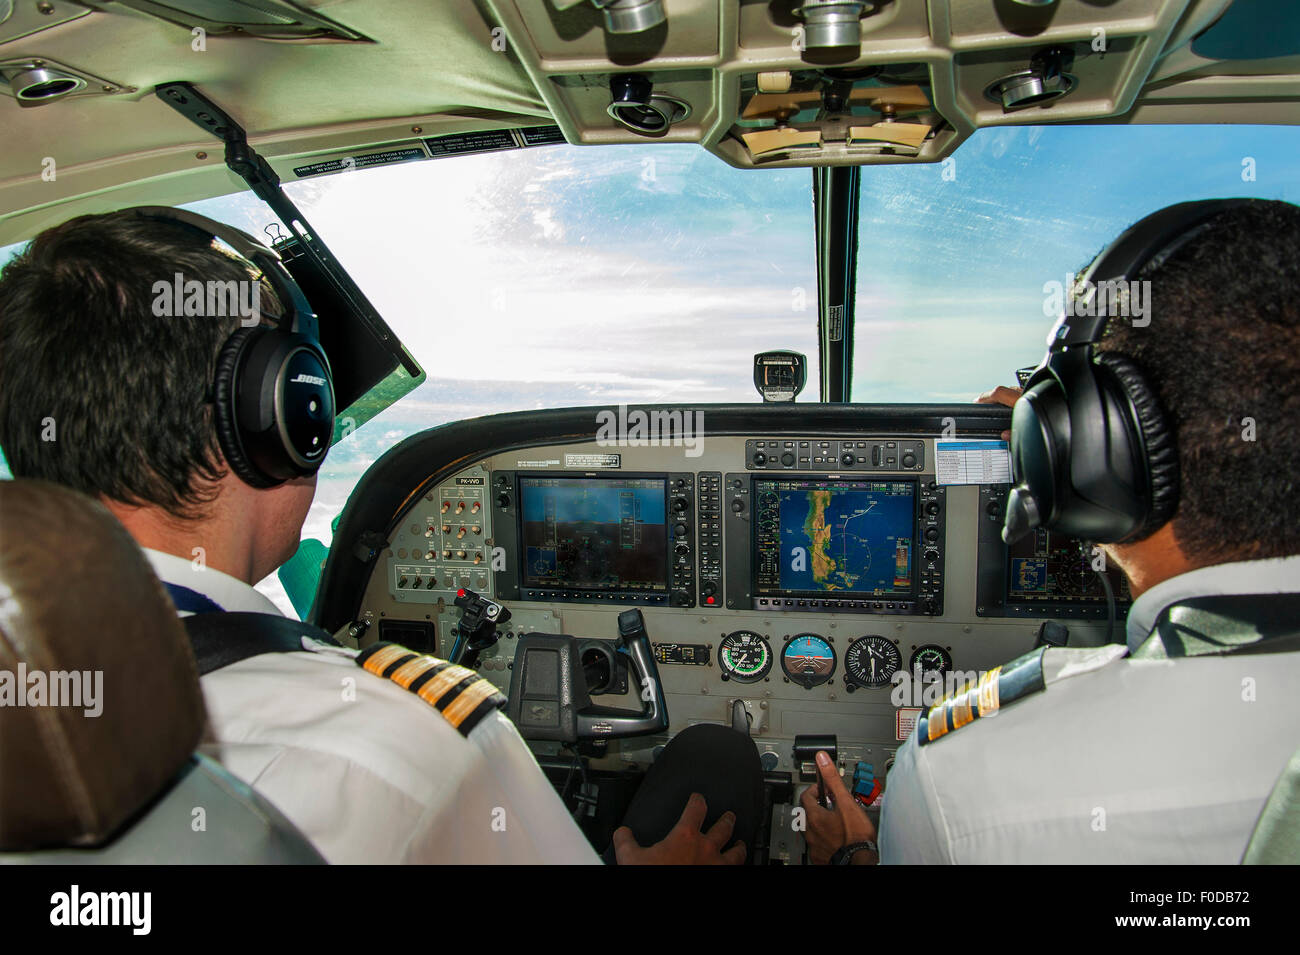 Cessna 208-B cockpit, turboprop, Maluku Islands, Indonesia - Stock Image